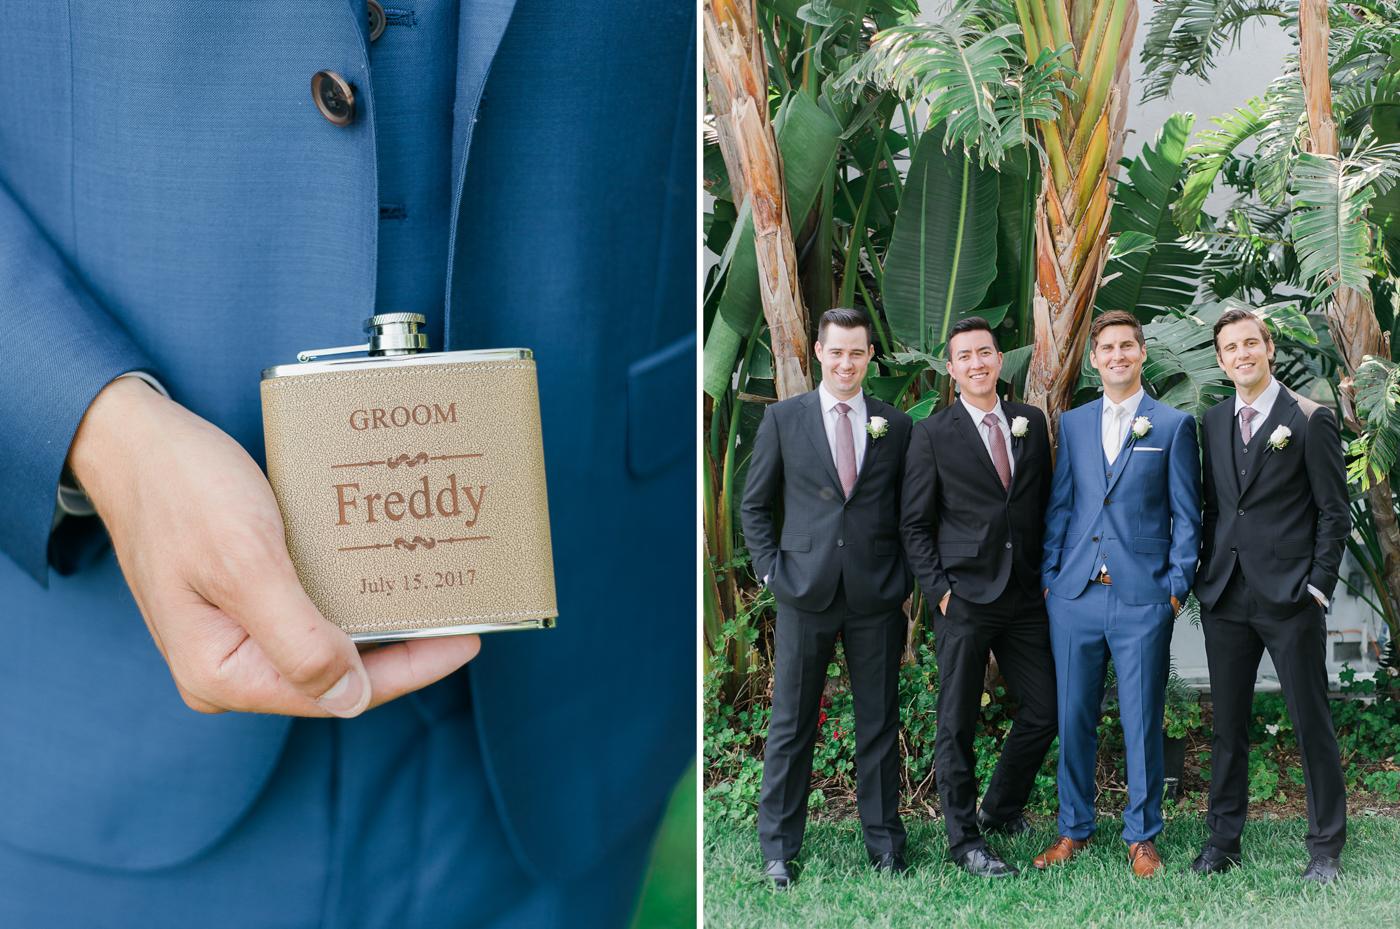 AKP_S&F_Malibu_Wedding_Fine_Art_Photography_Los_Angeles-9_groomsmen_gift.jpg